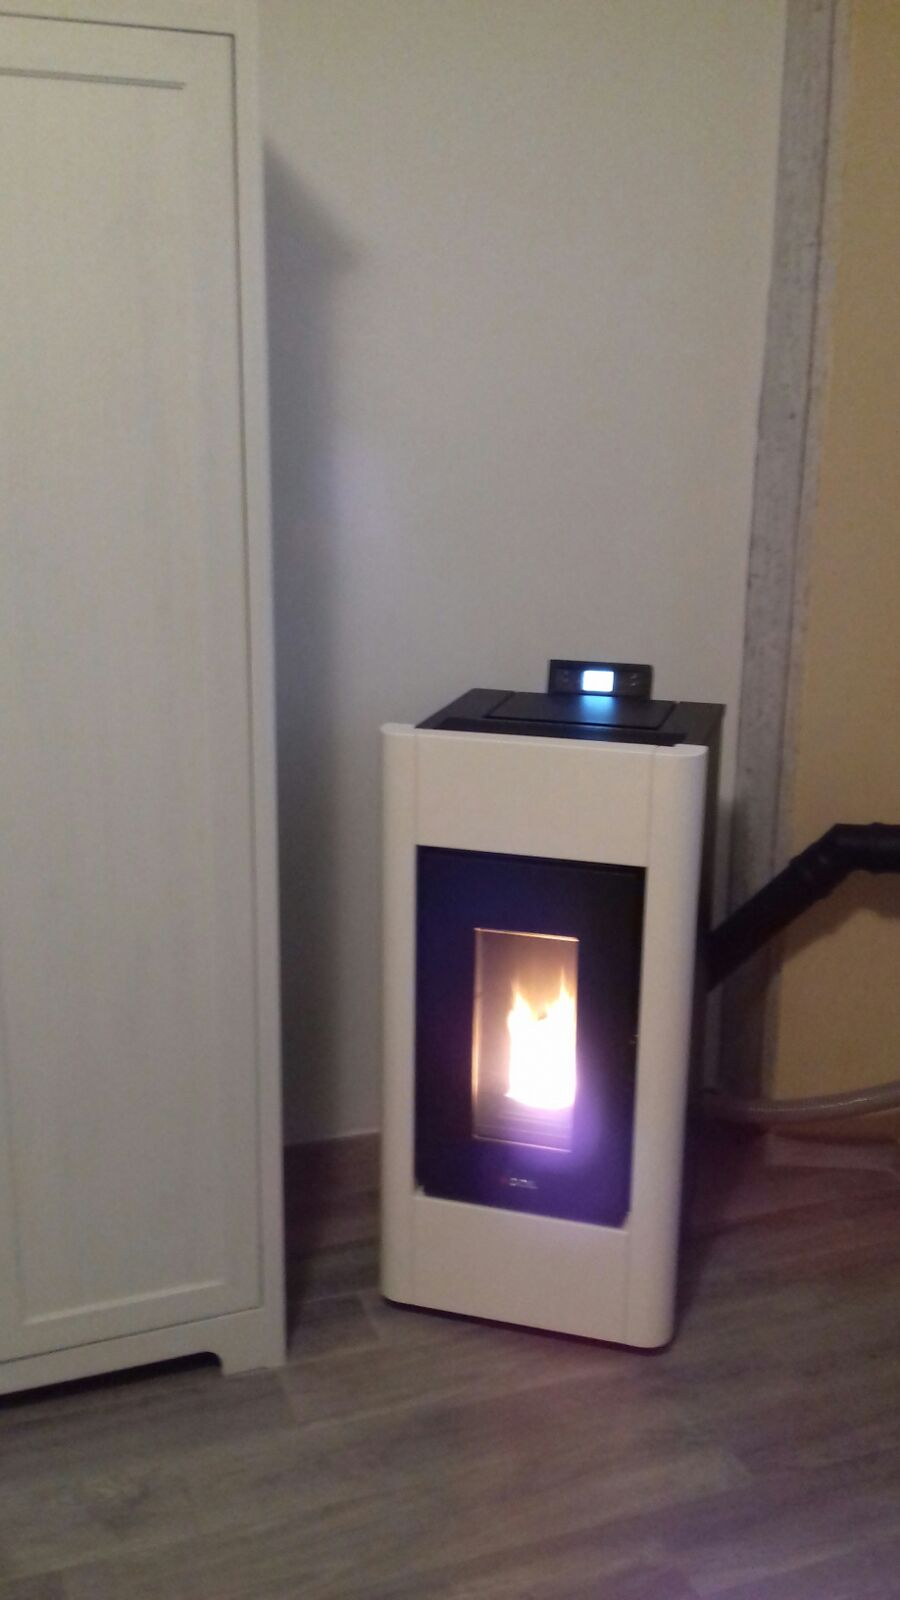 Rivenditori Stufe A Pellet Lombardia installazione stufa a pellet cadel - la bottega del fuoco